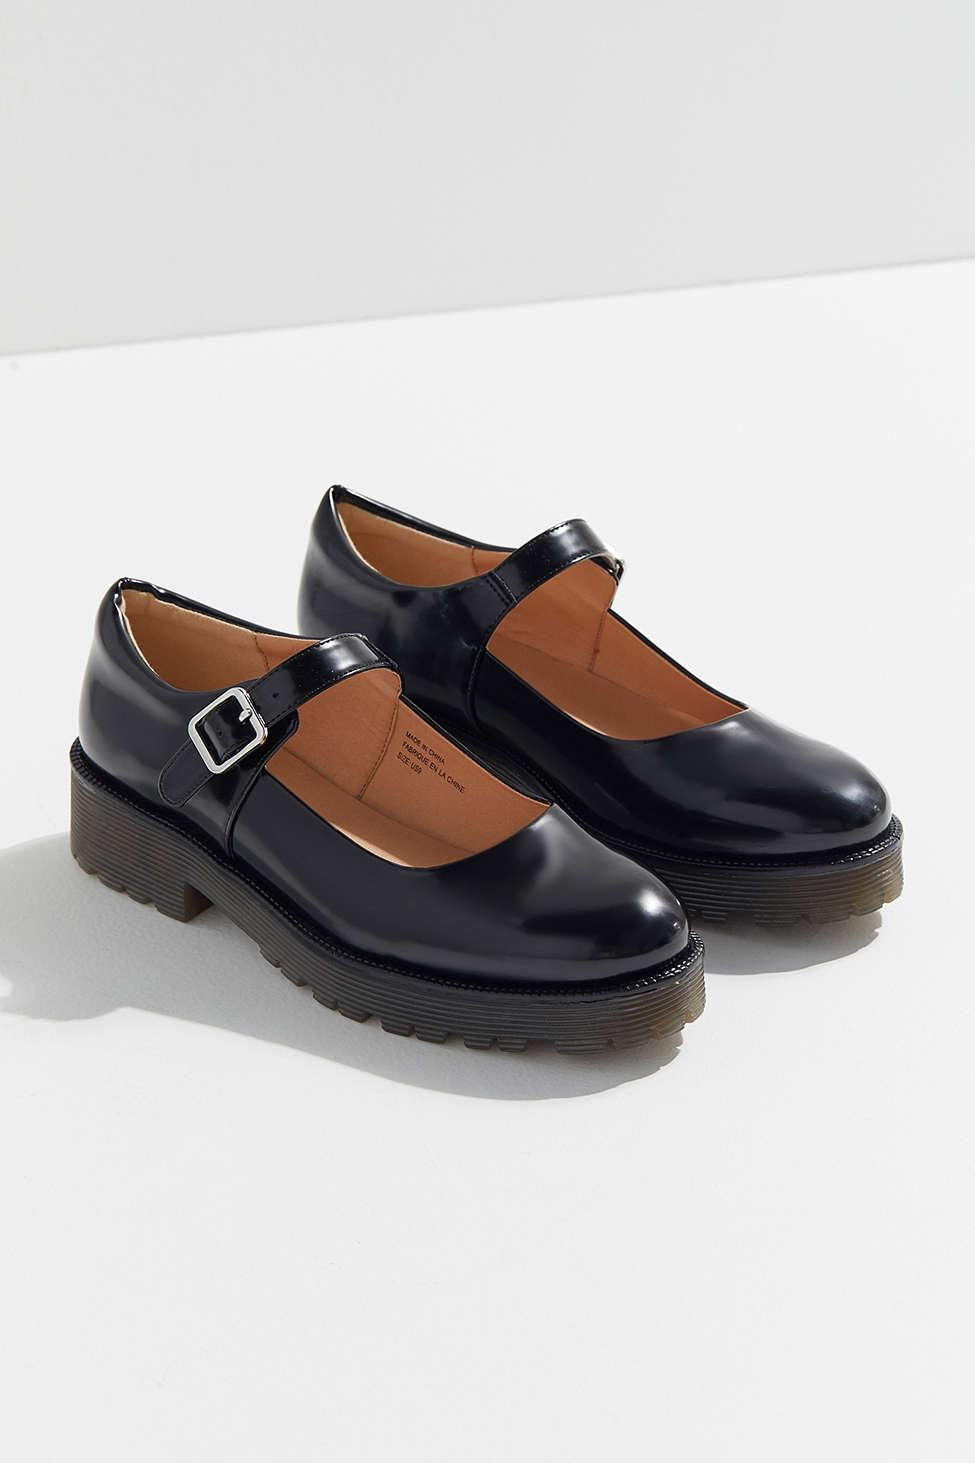 9ba487652ec59 Lyst - Urban Outfitters Greta Mary Jane Oxford in Black